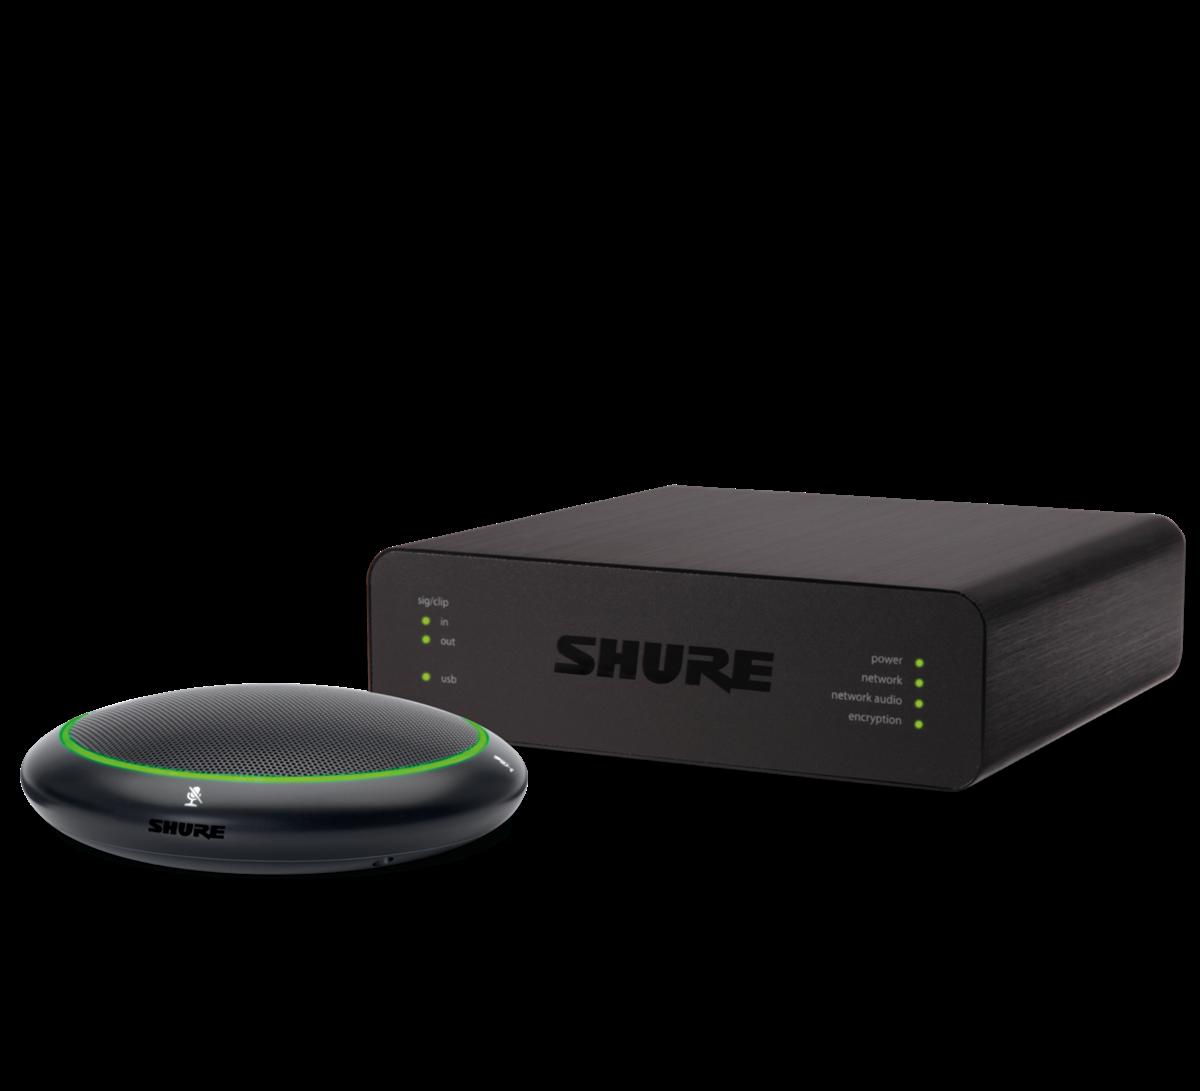 Shure MXA310 and ANIUSB Table Array Intellimix White